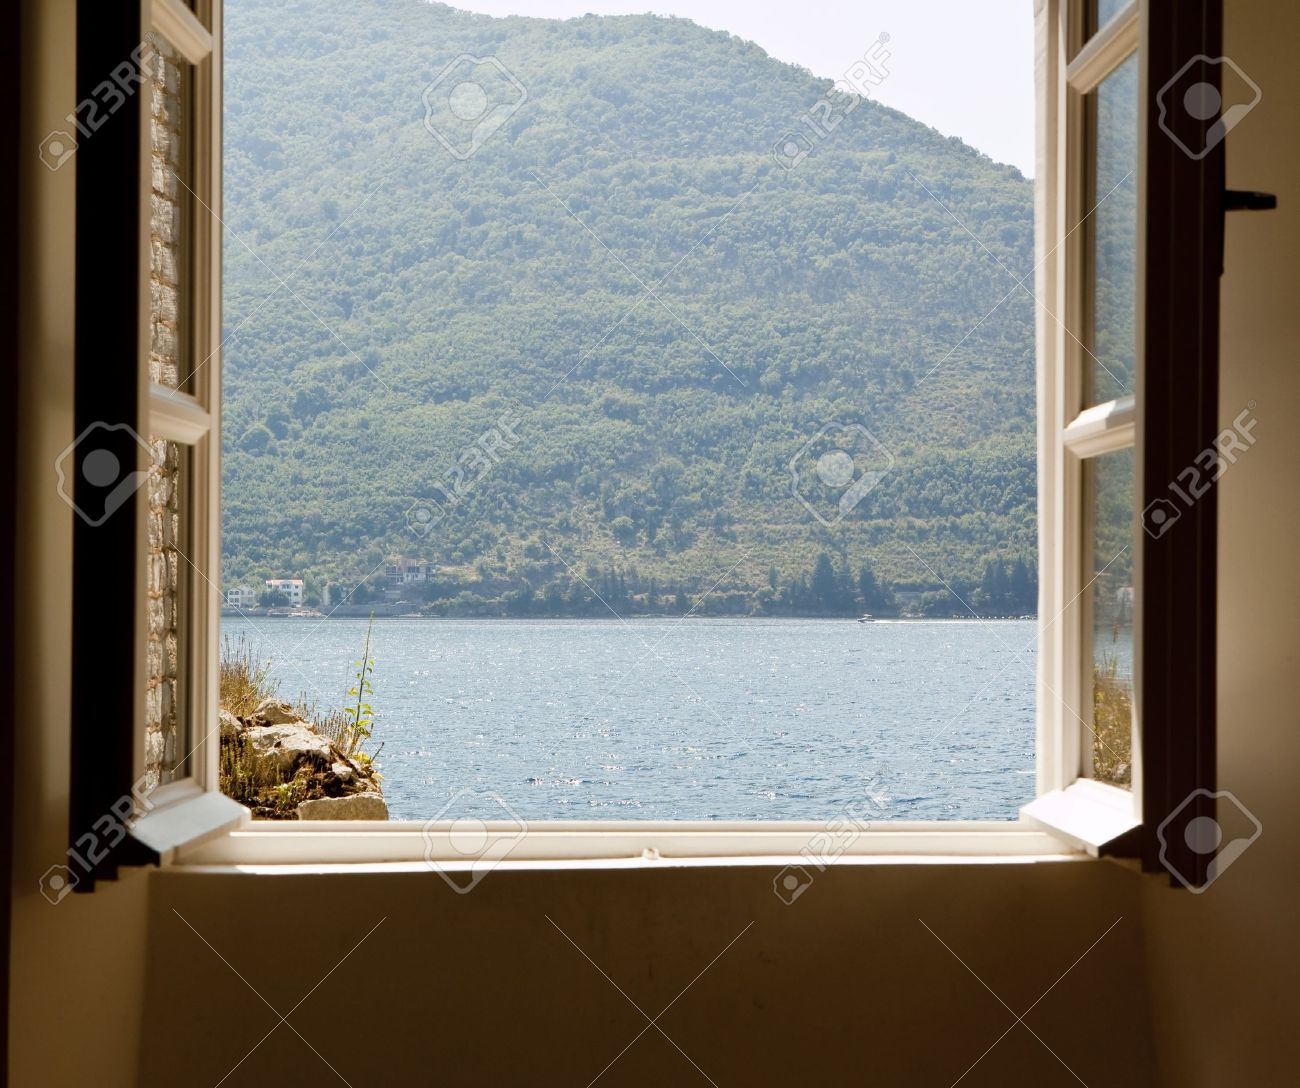 window wuth sea view Stock Photo - 10875798